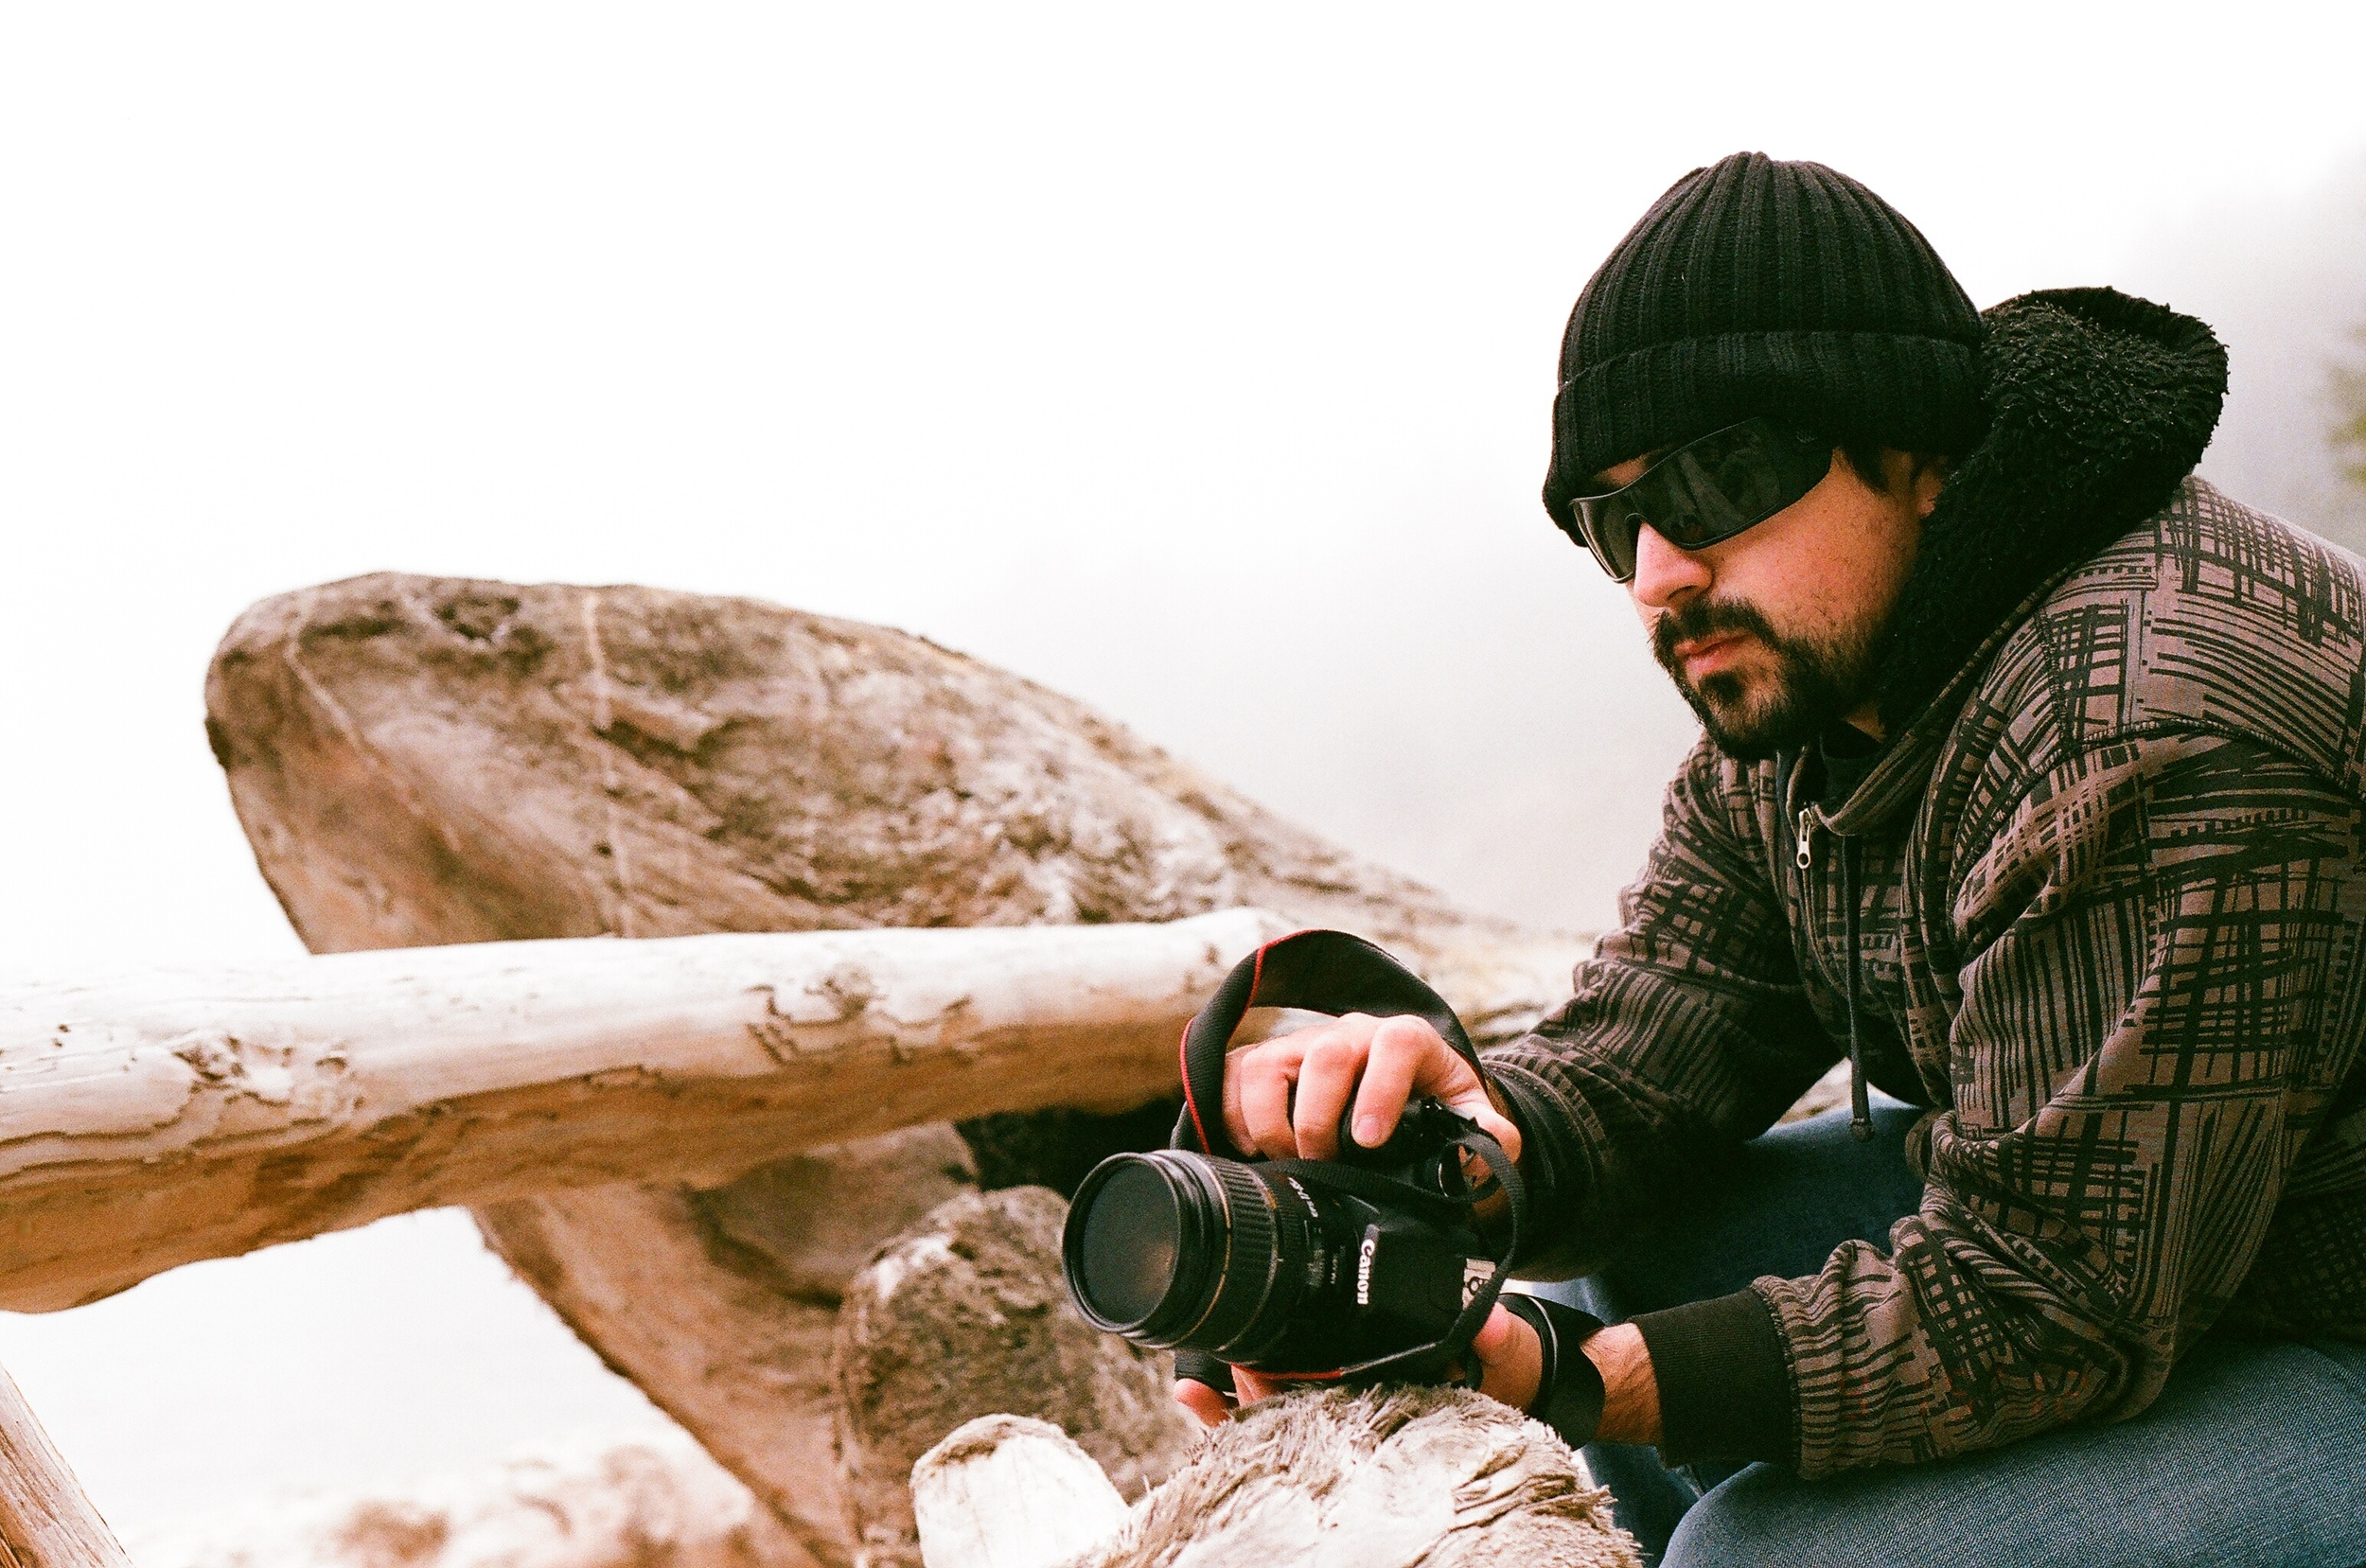 joey-leon-photography-film-35mm.jpg